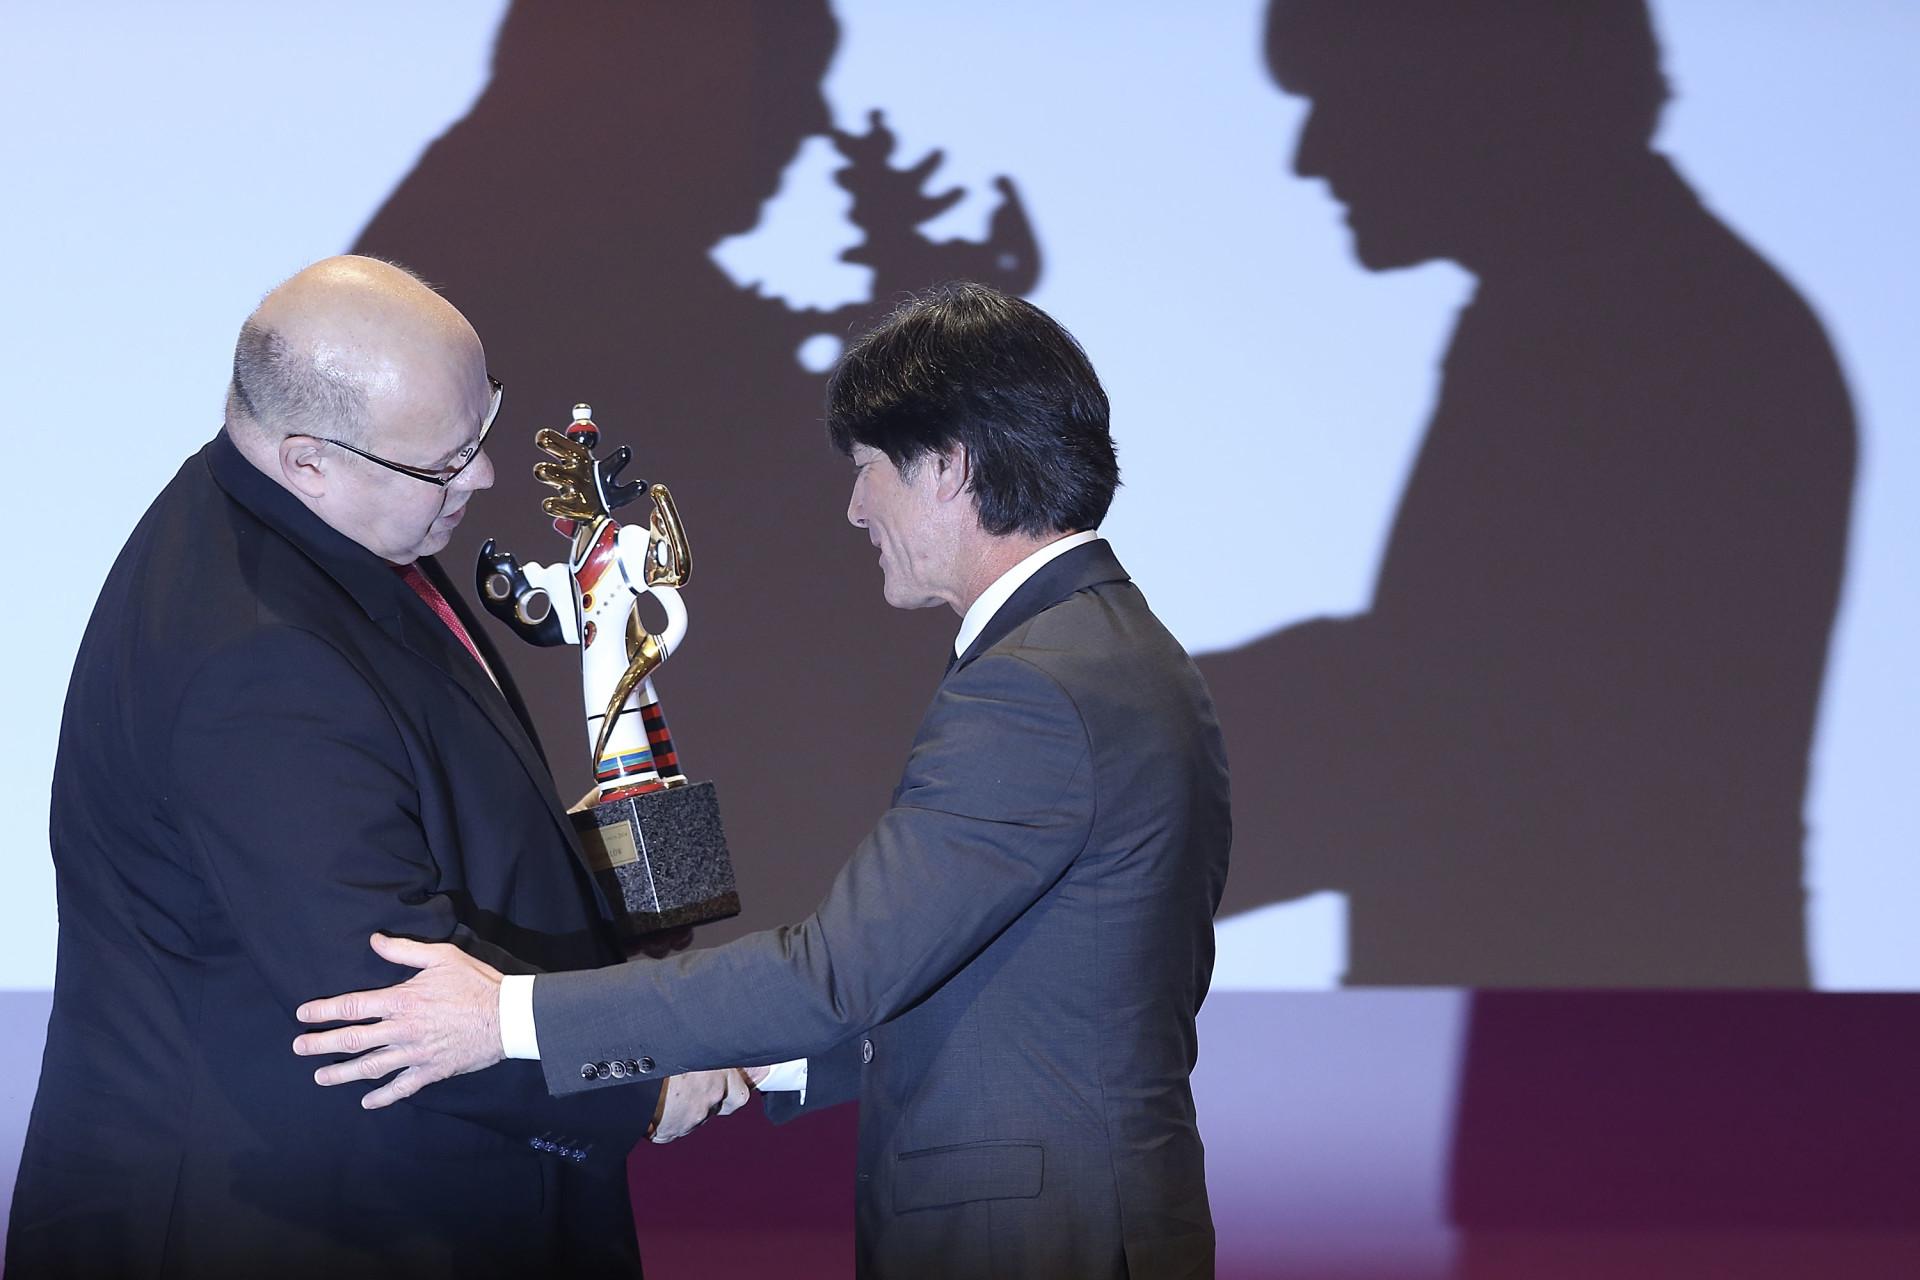 Deutscher Medienpreis an Joachim Löw